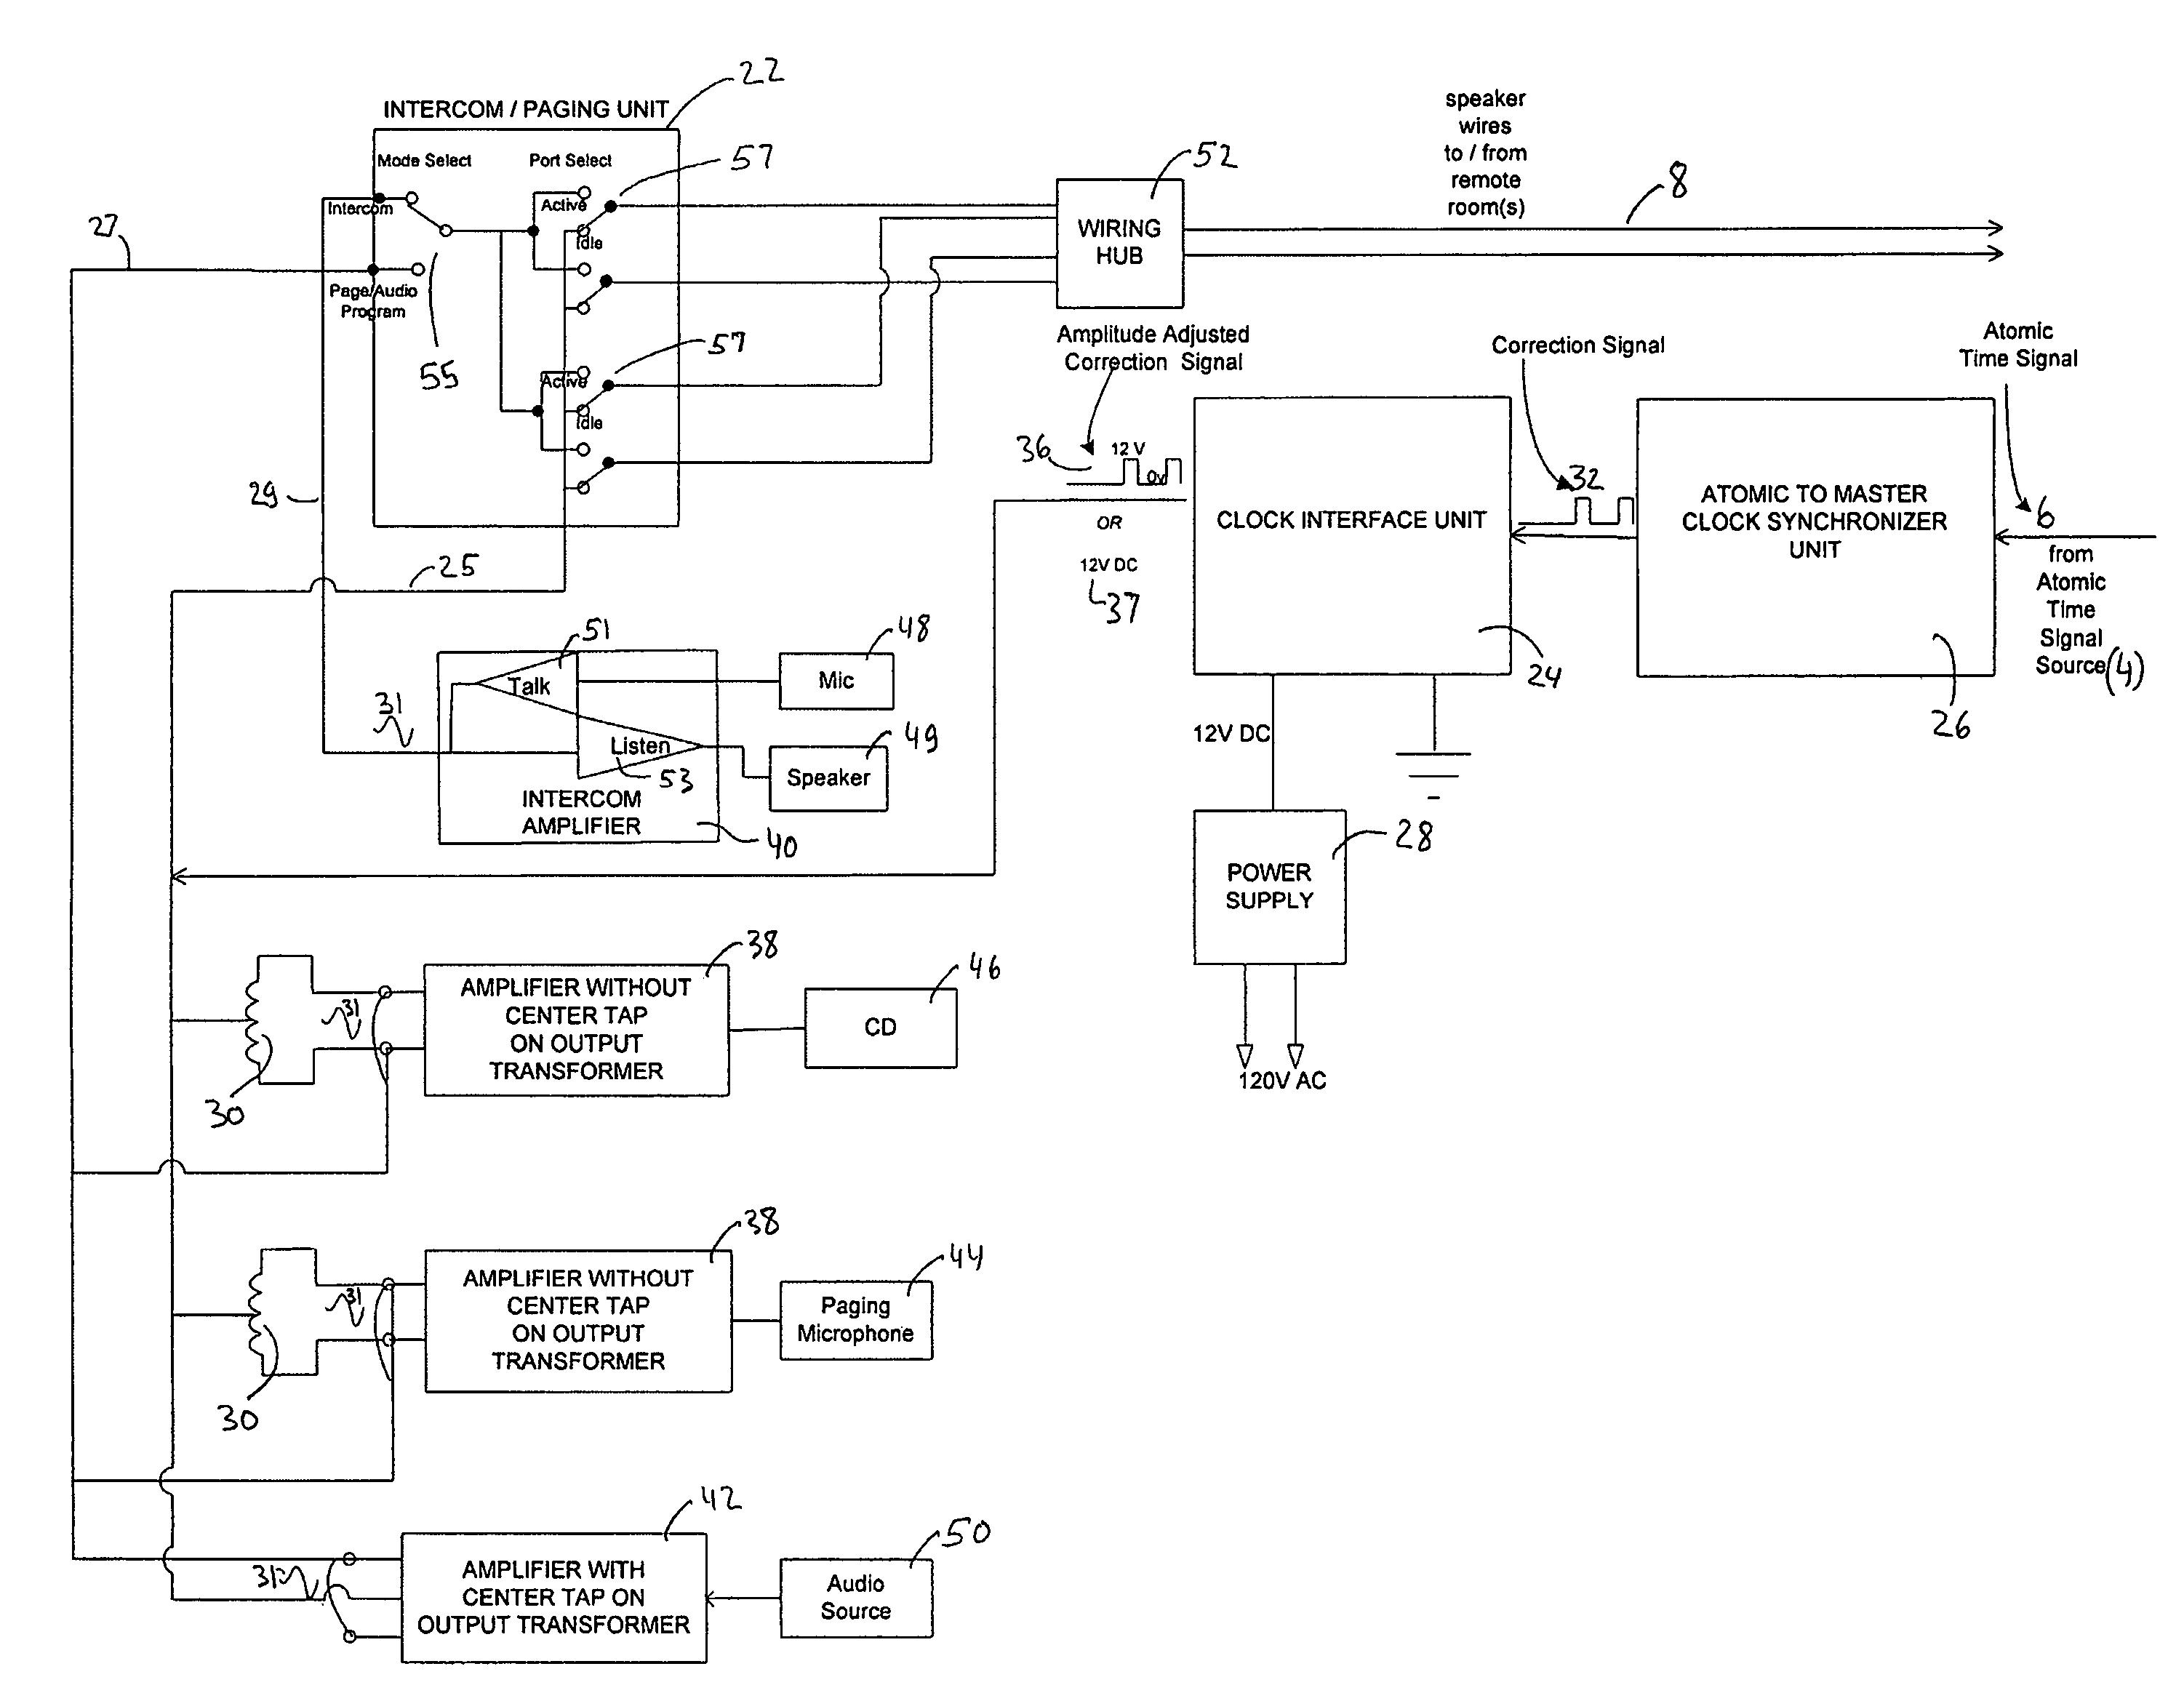 6265 Jeron Nurse Call Wiring Diagram Electrical Diagrams Intercom Schematics U2022